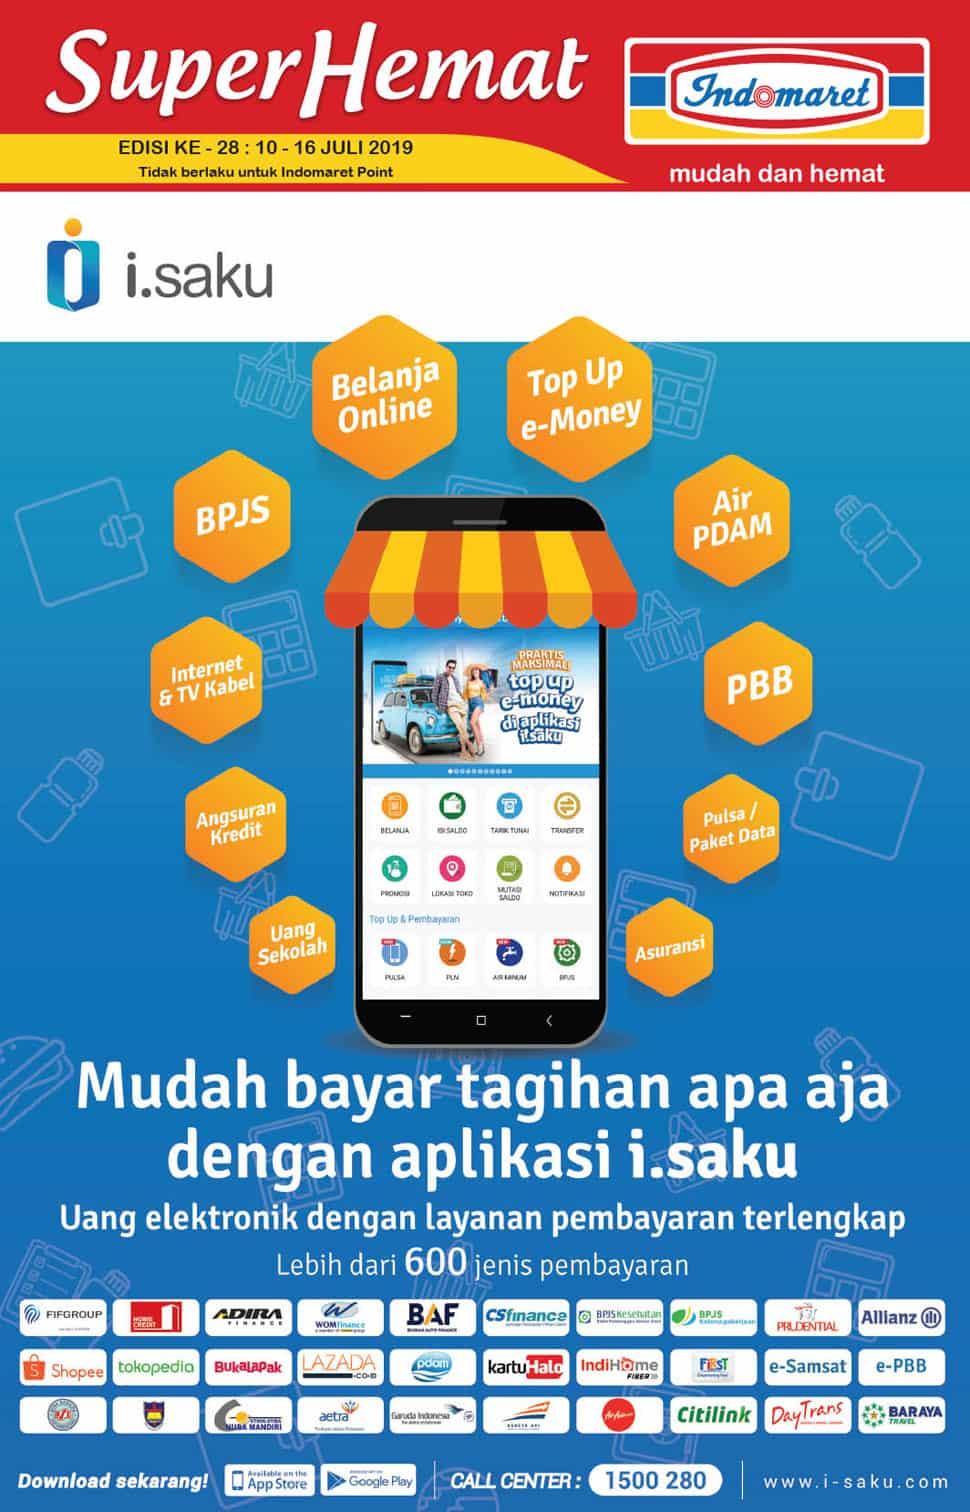 Diskon Promo INDOMARET Katalog Super Hemat periode 10-16 Juli 2019